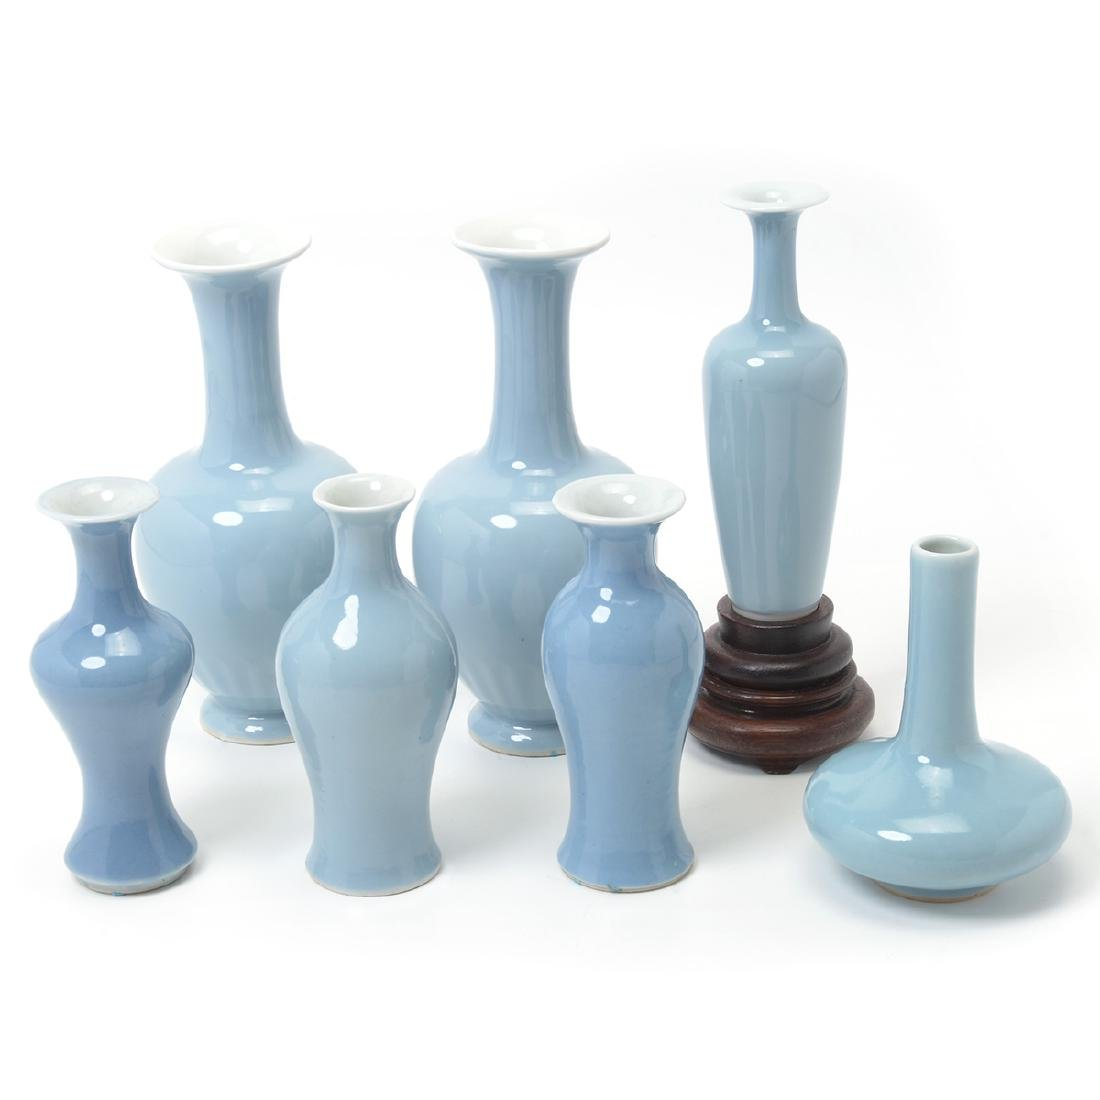 Seven Clair-de-Lune Glazed Vases, 19th Century